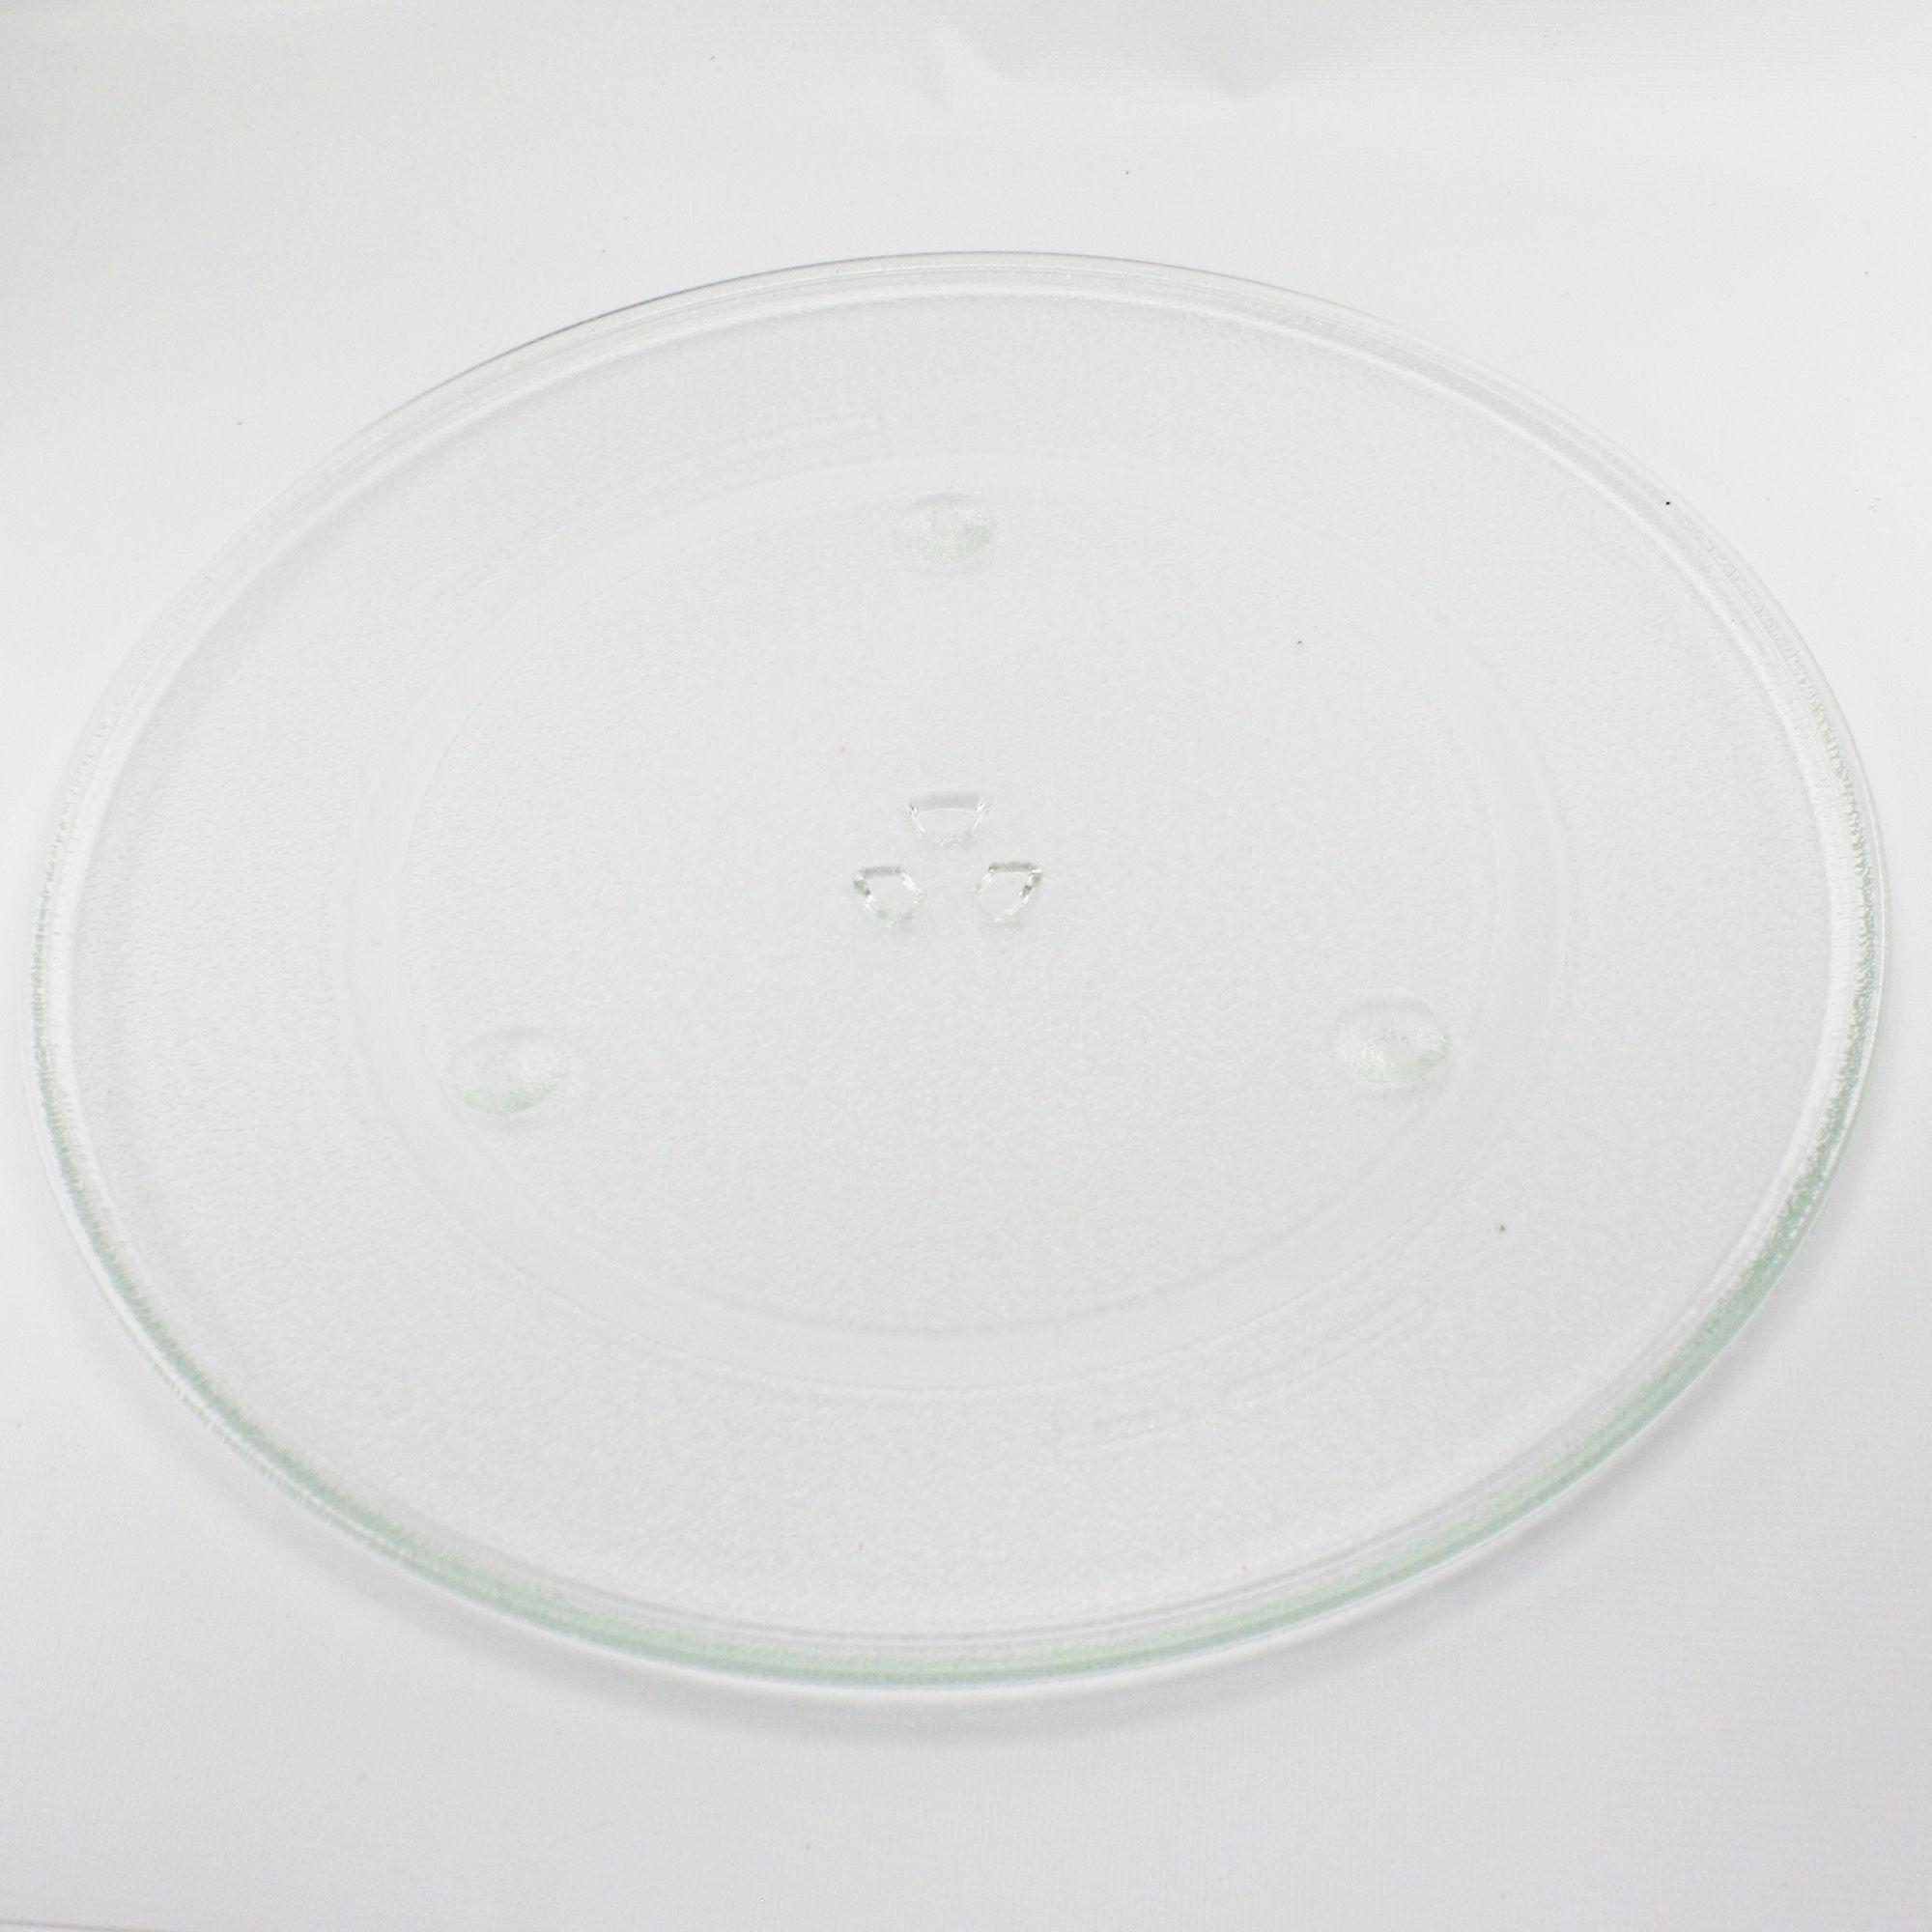 Genuine Oem Panasonic F06014m00ap Microwave Gl Tray Matsua